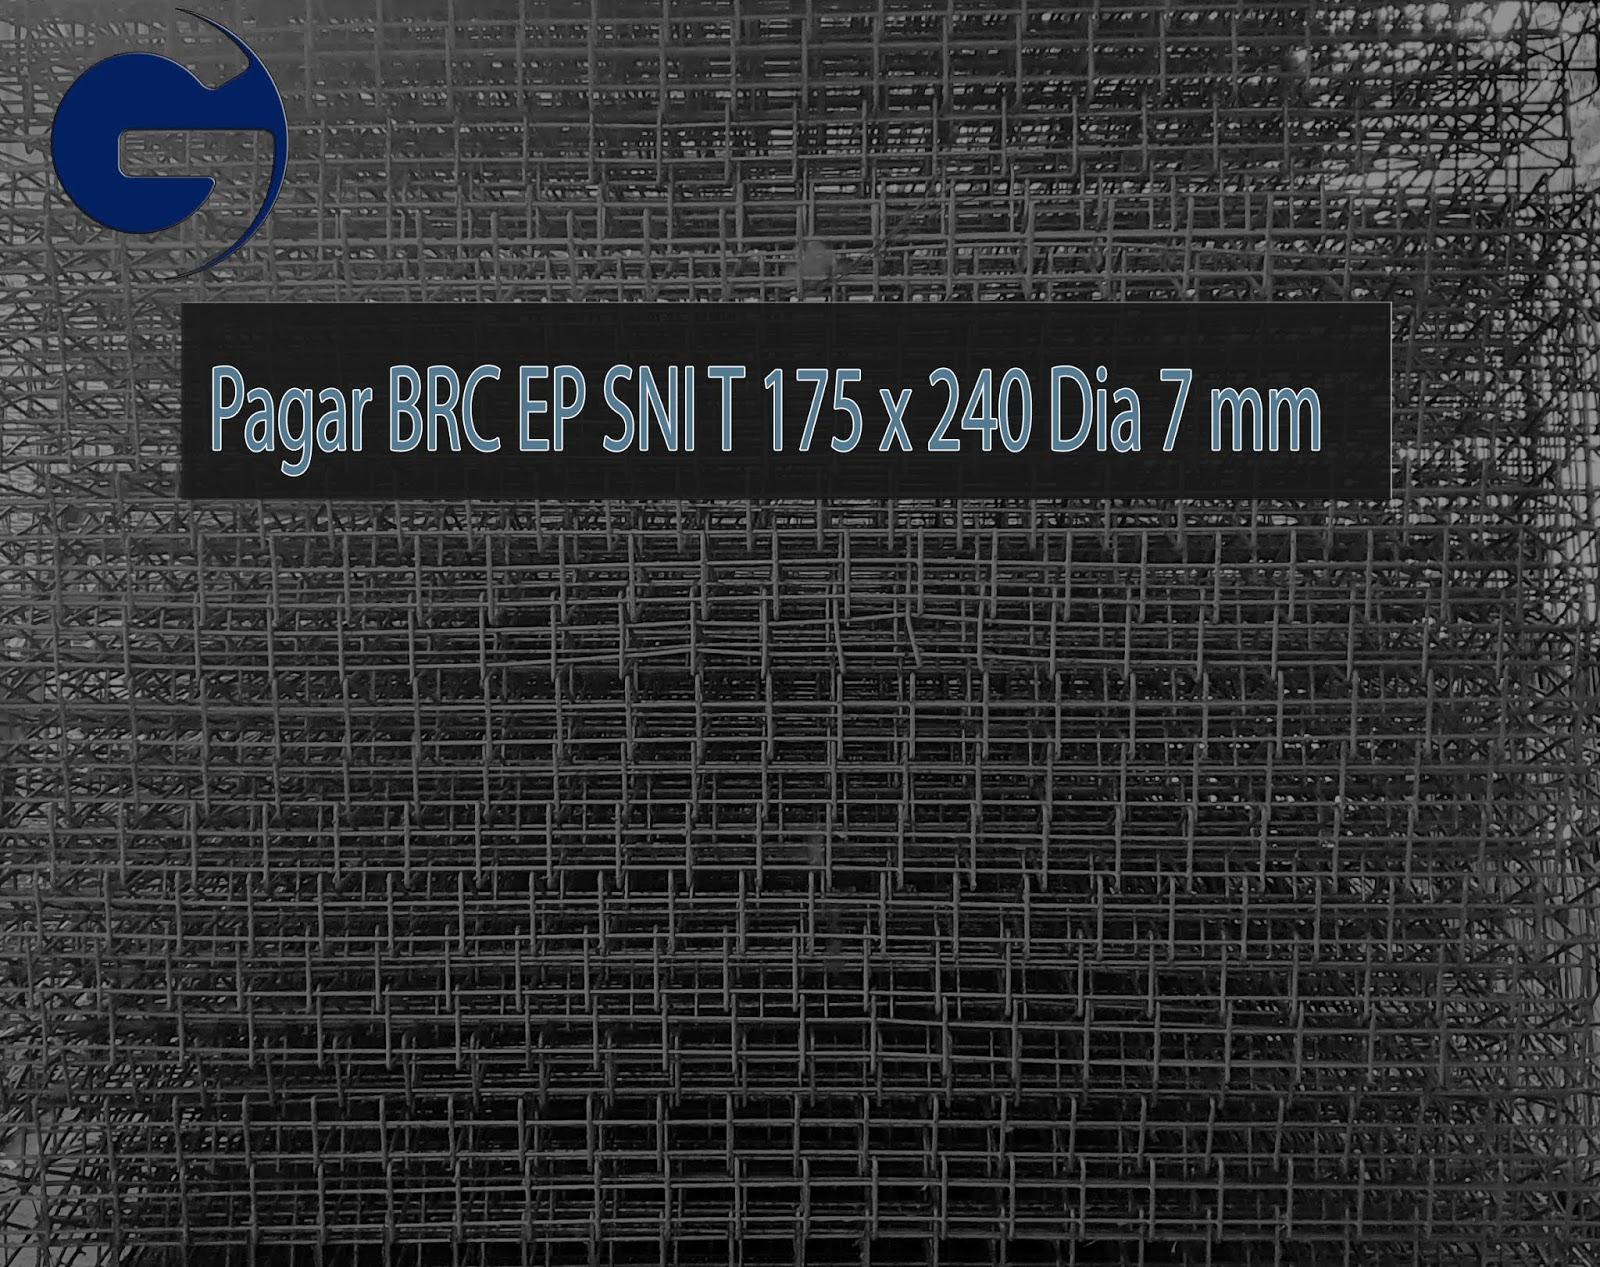 Jual Pagar BRC EP SNI T 175 x 240 Dia 7 mm